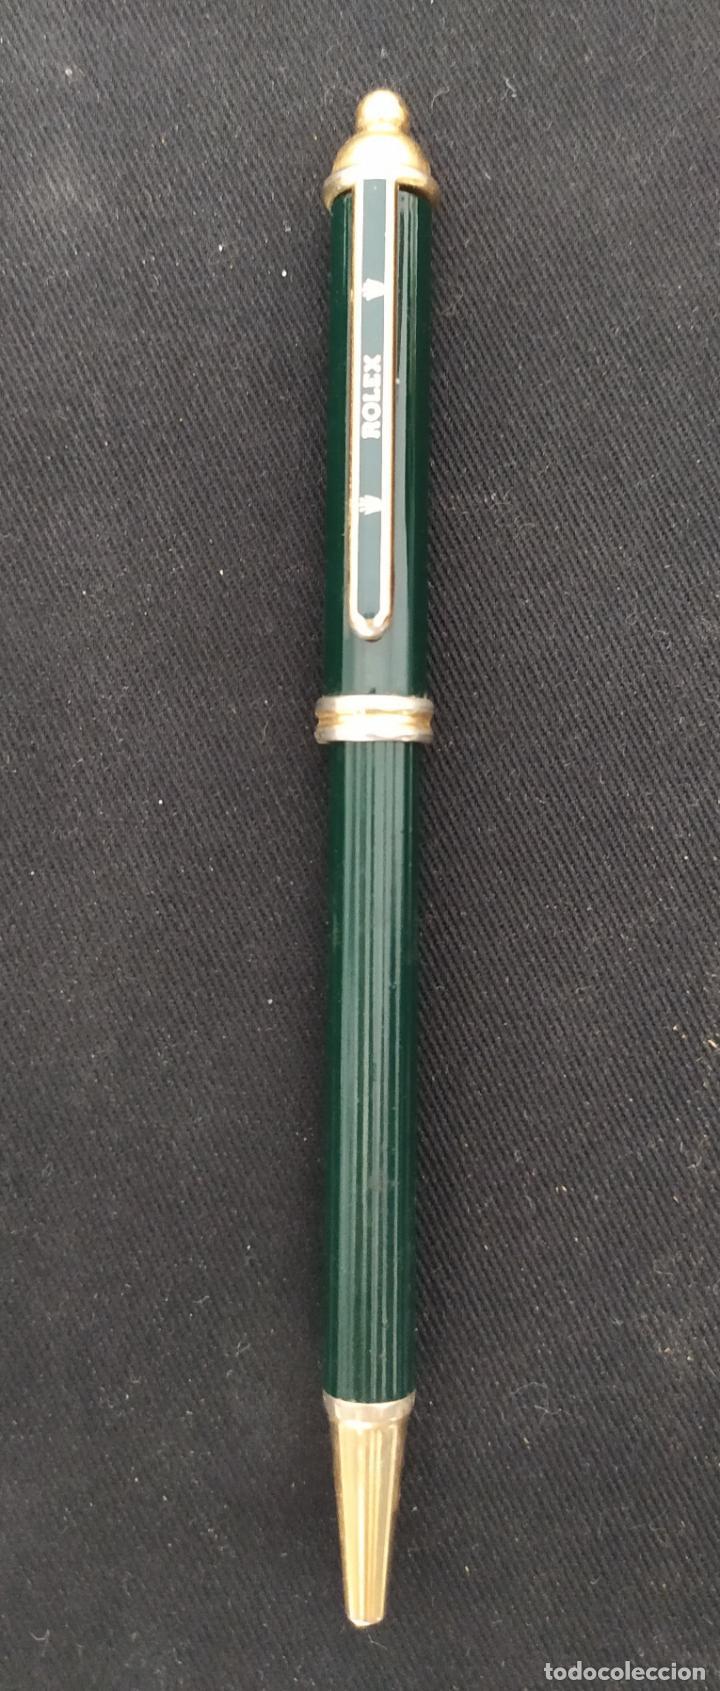 Bolígrafos antiguos: BOLIGRAFO ROLEX - Foto 2 - 205332616